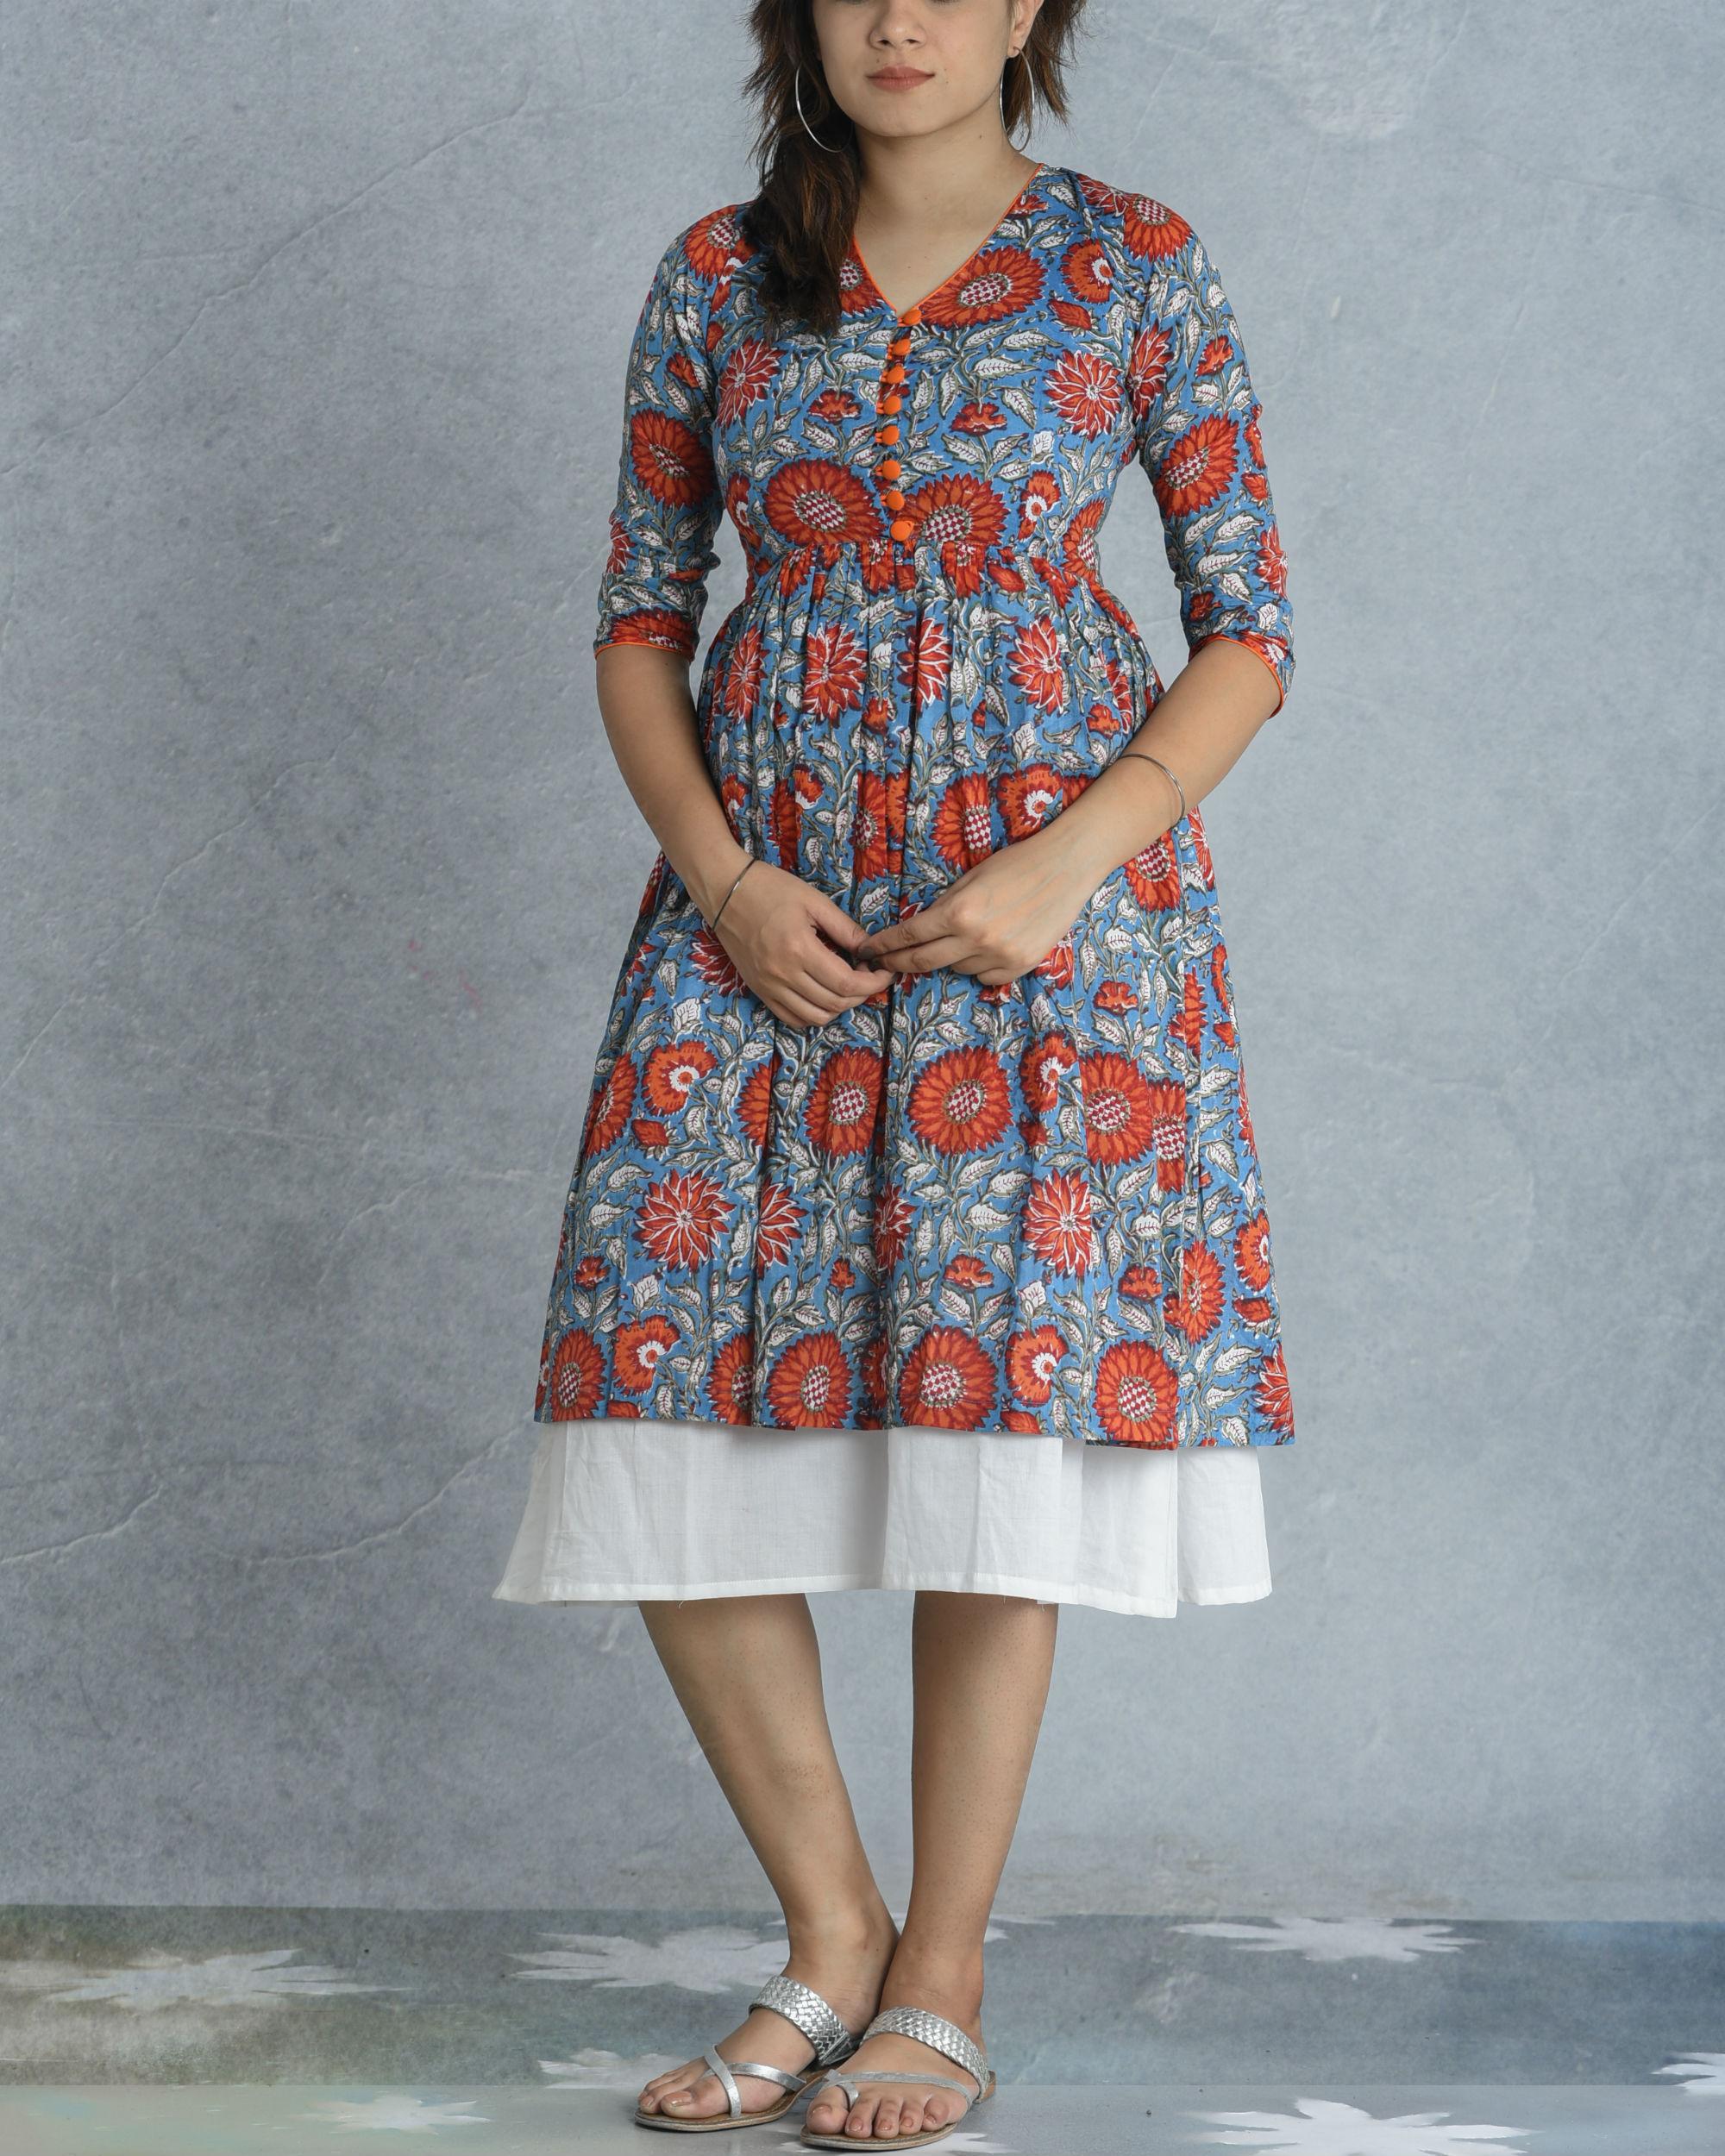 Teal border dress